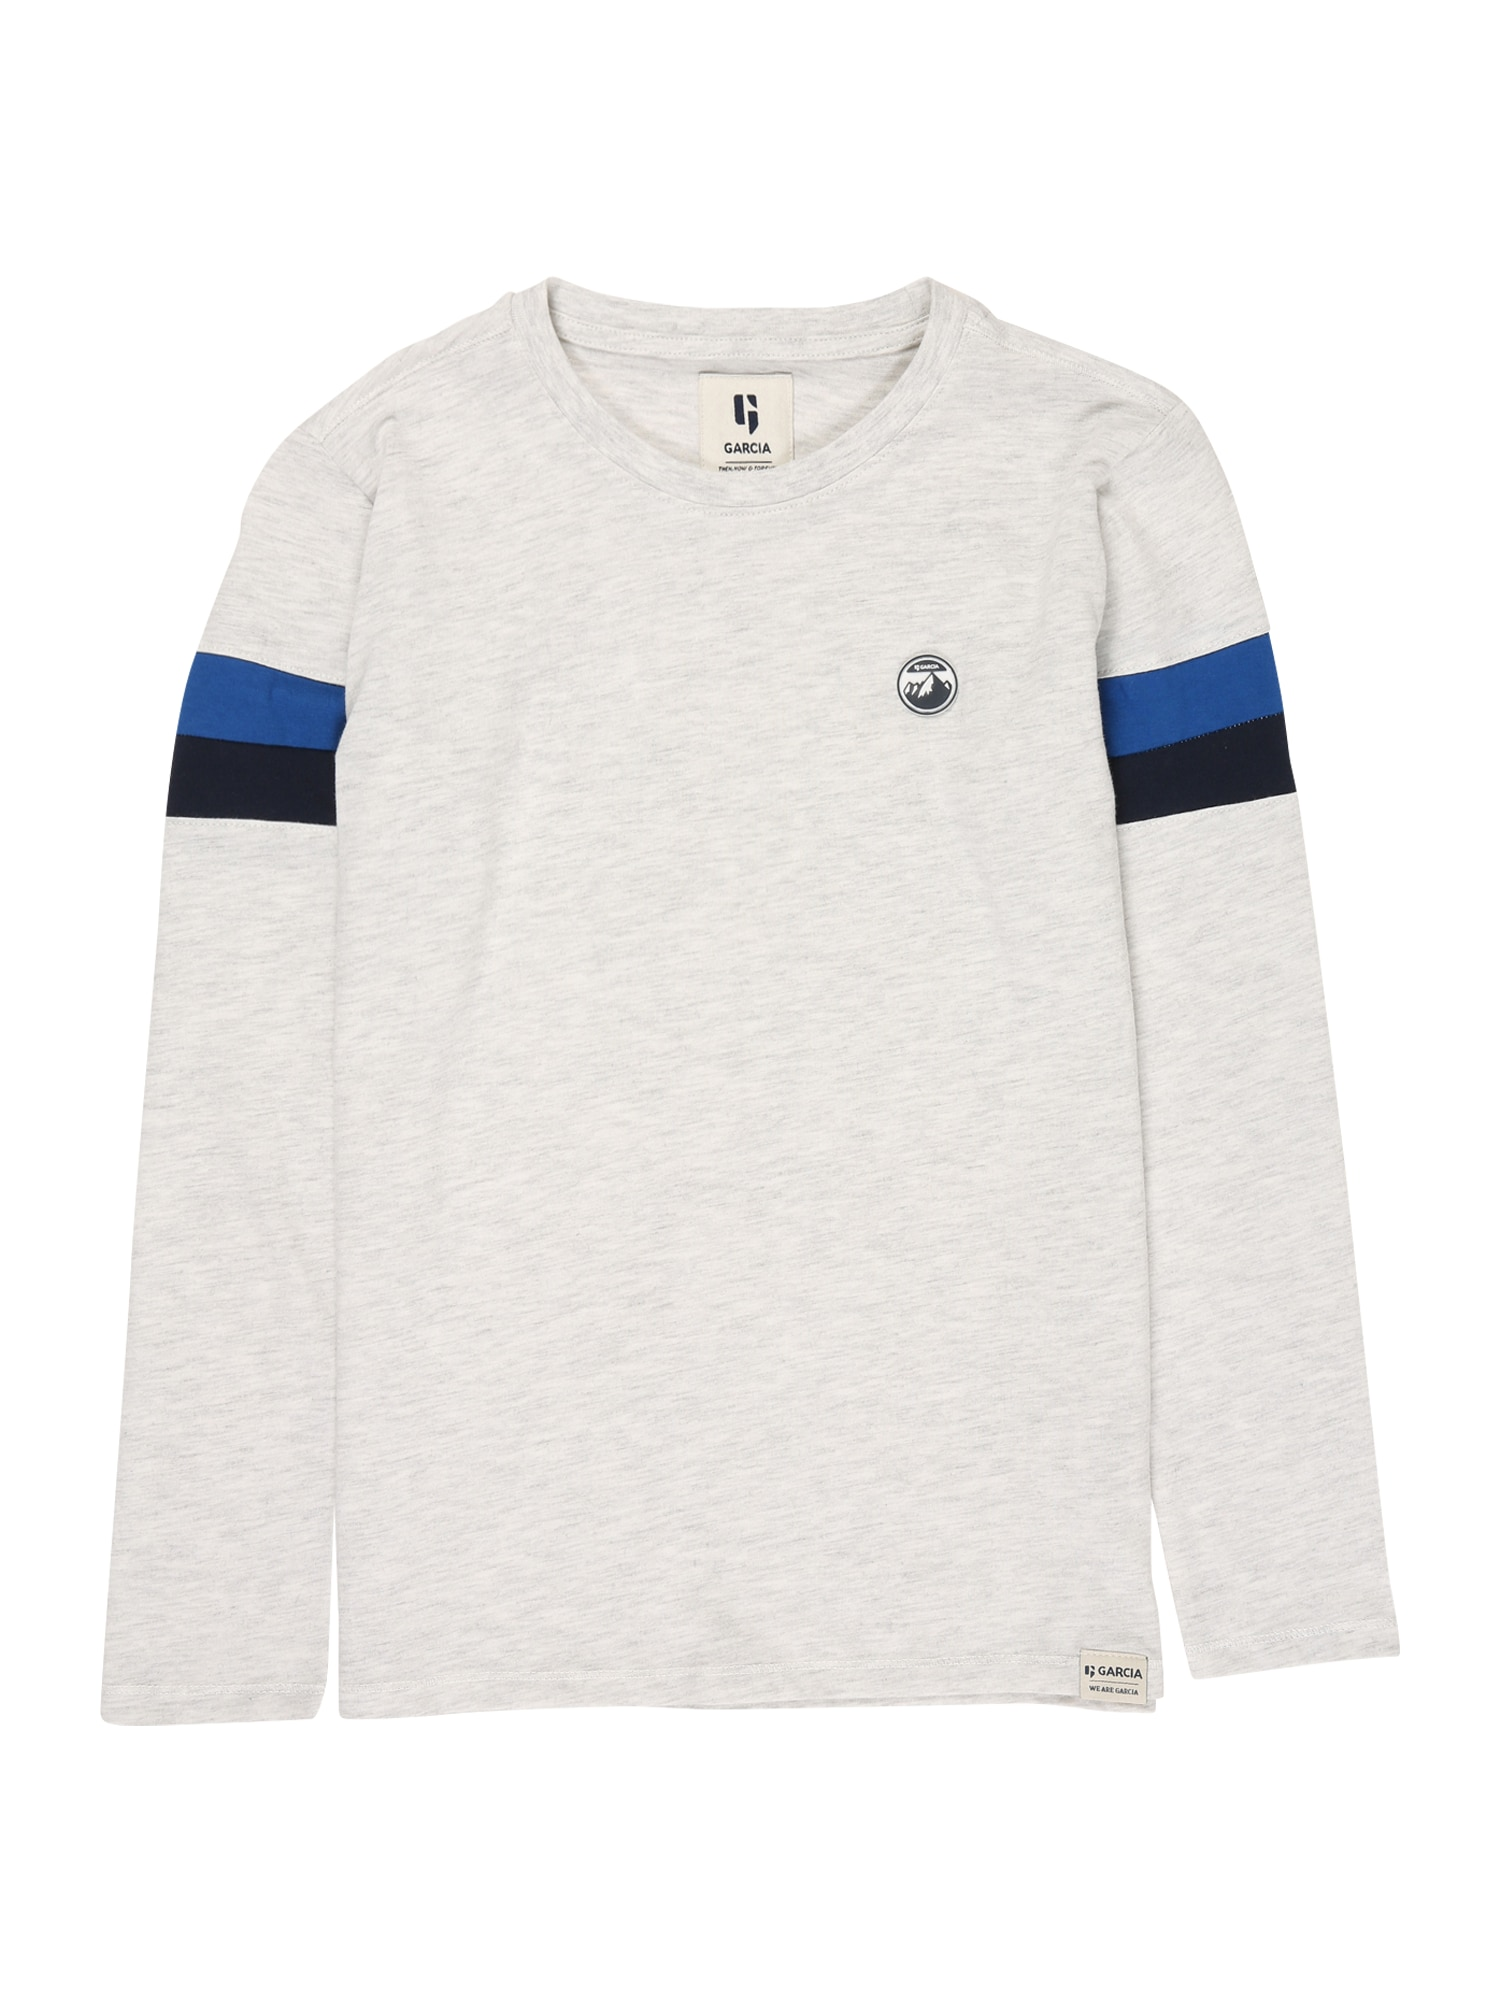 GARCIA Tričko  biela / modrá / čierna